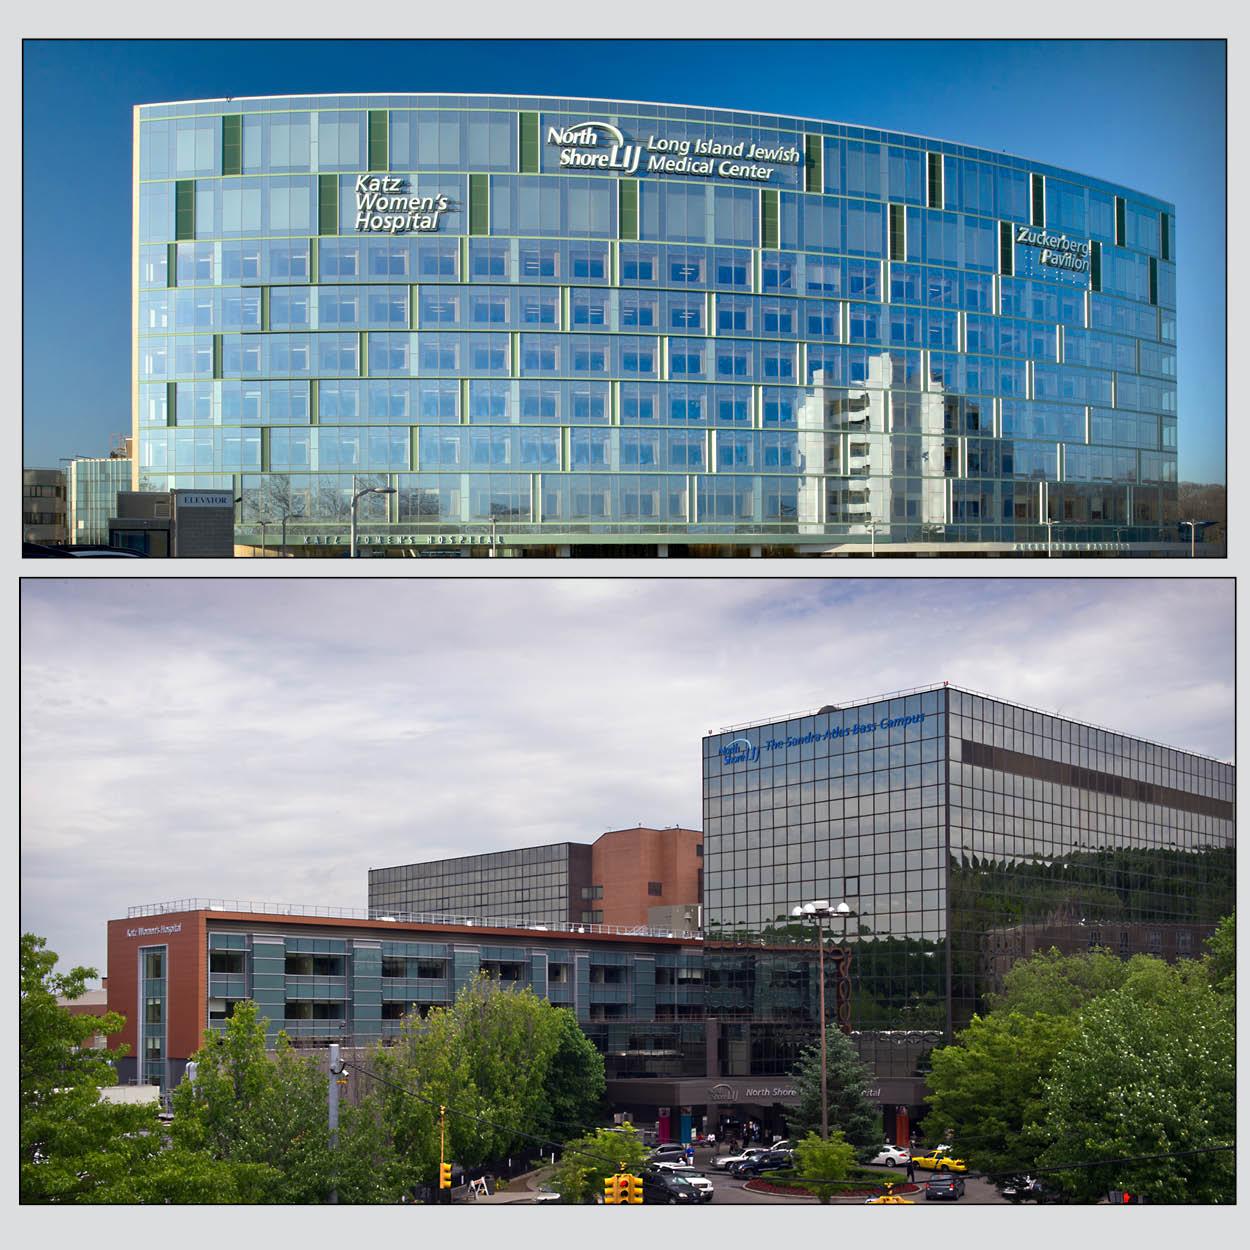 NorthShore University Hospital | 100 Hospitals & Health